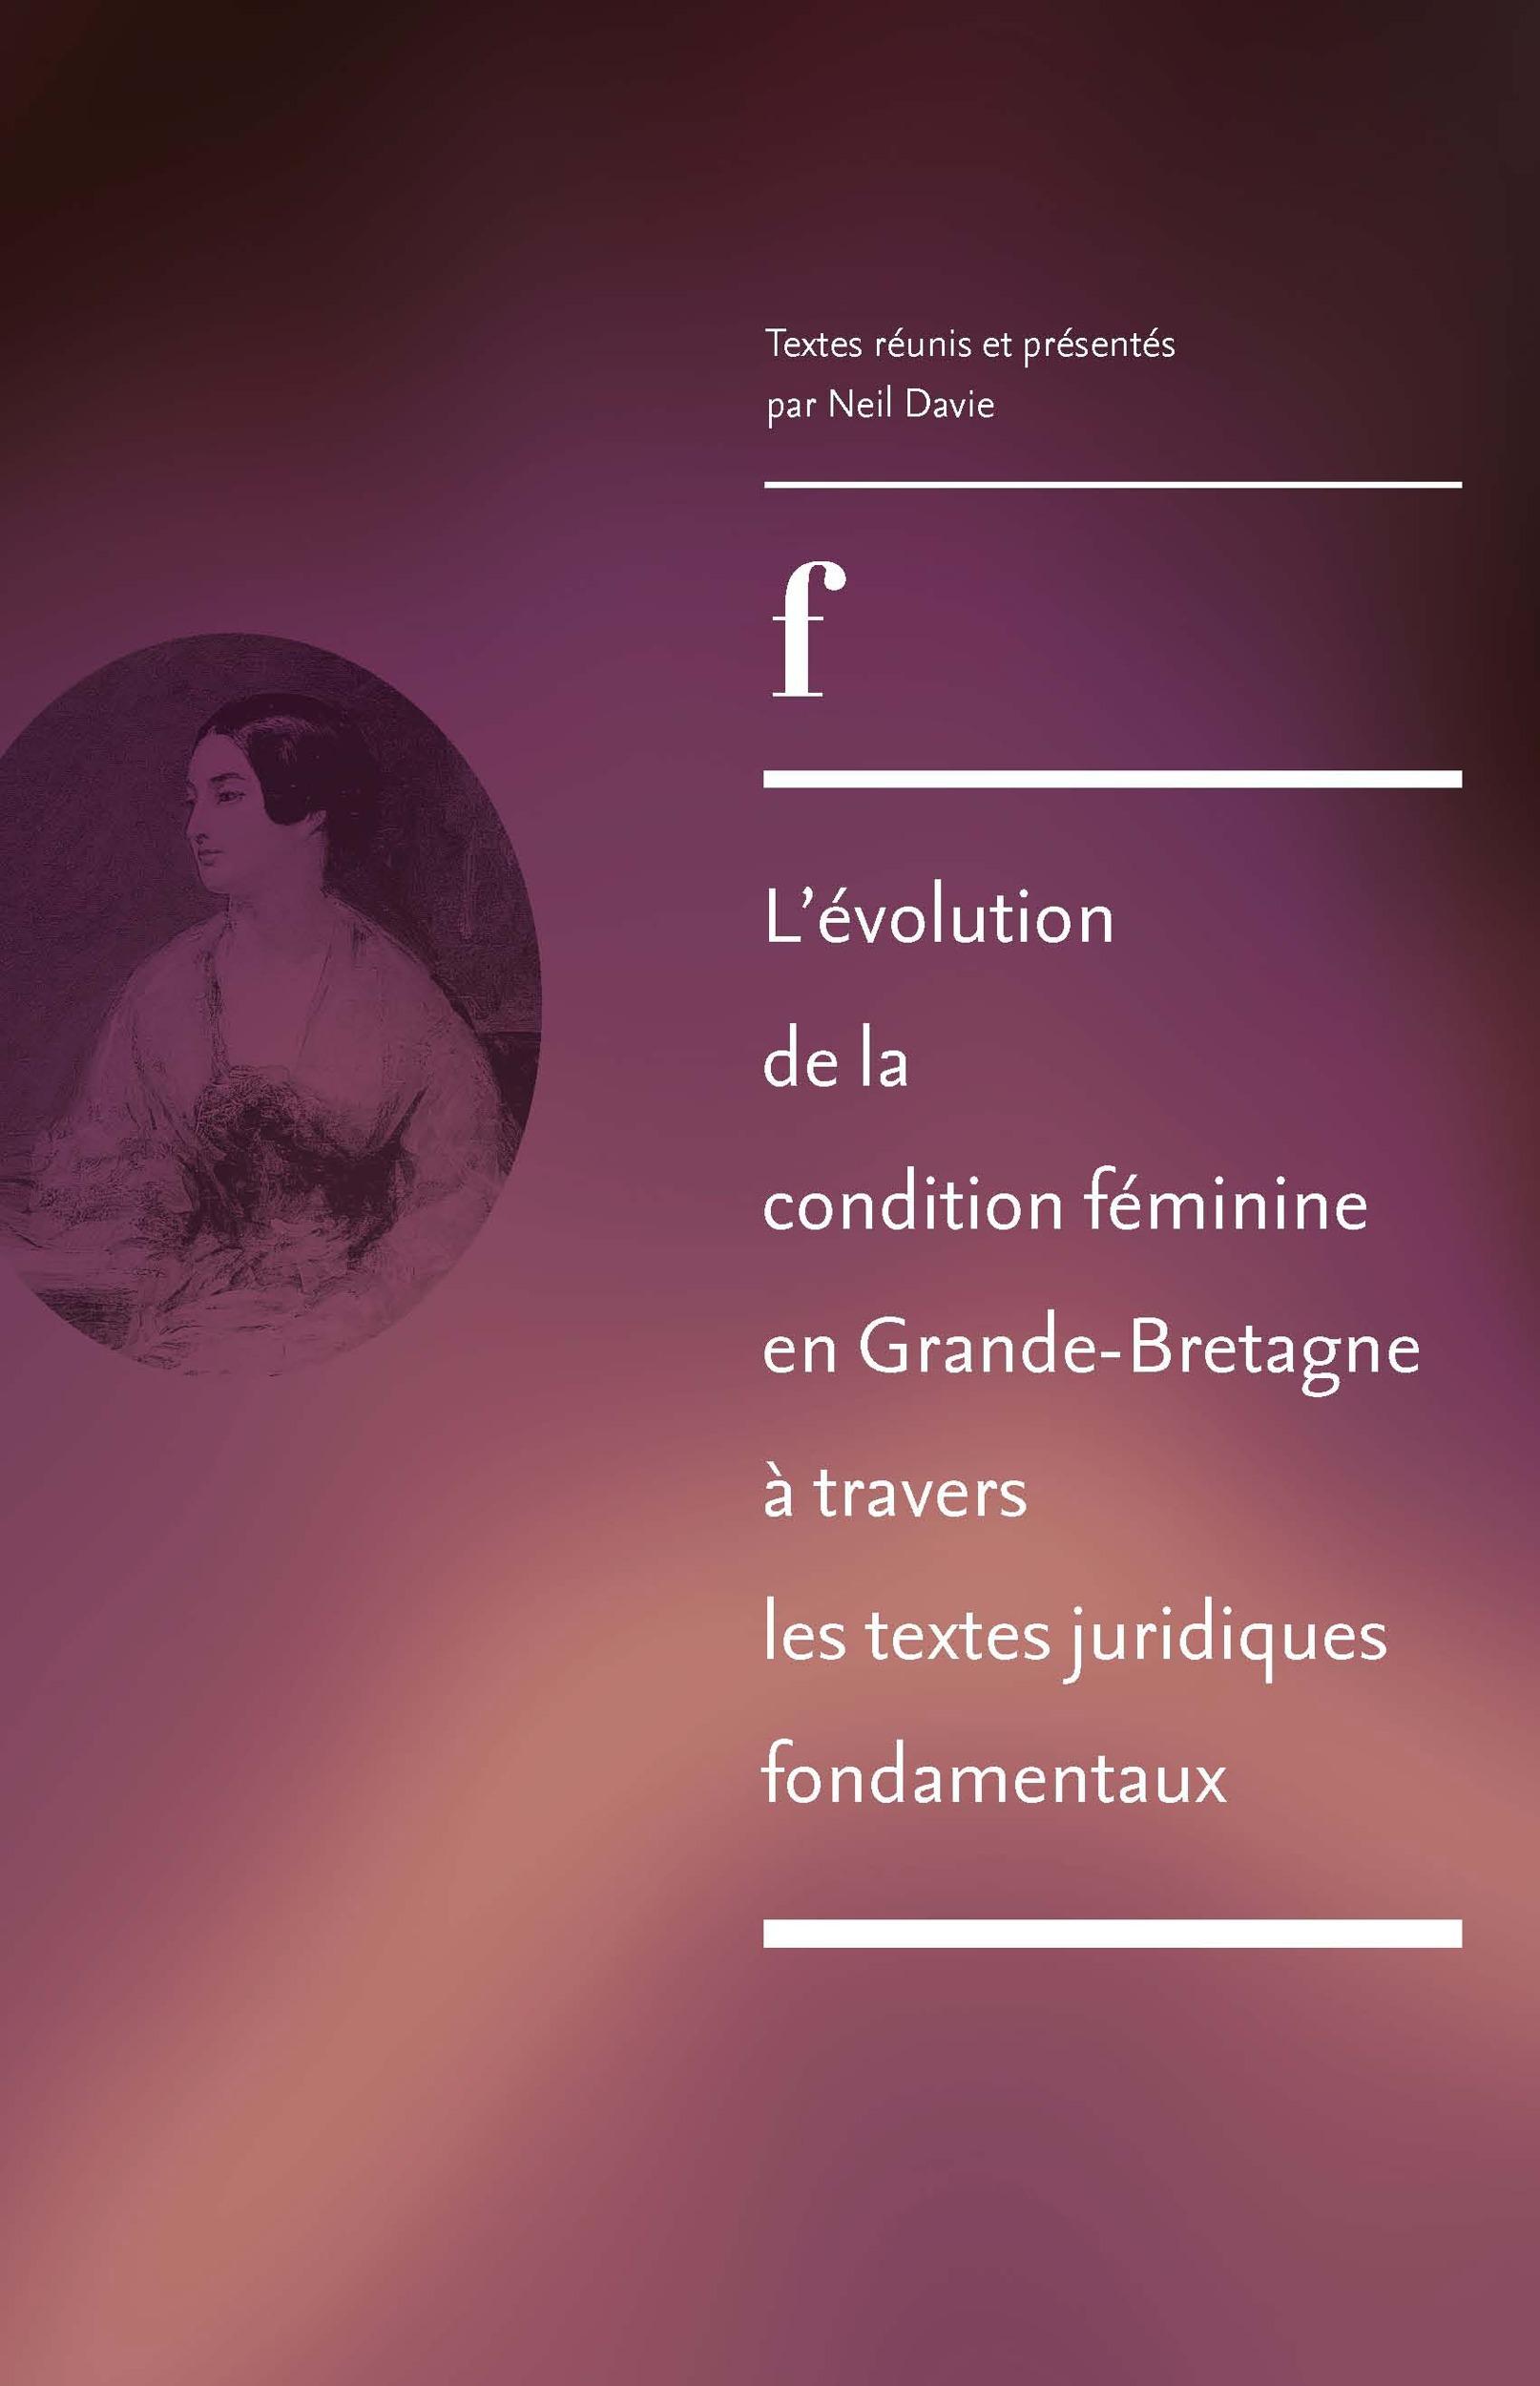 l'evolution de la condition feminine en grande-bretagne a travers les textes juridiques fondamentaux